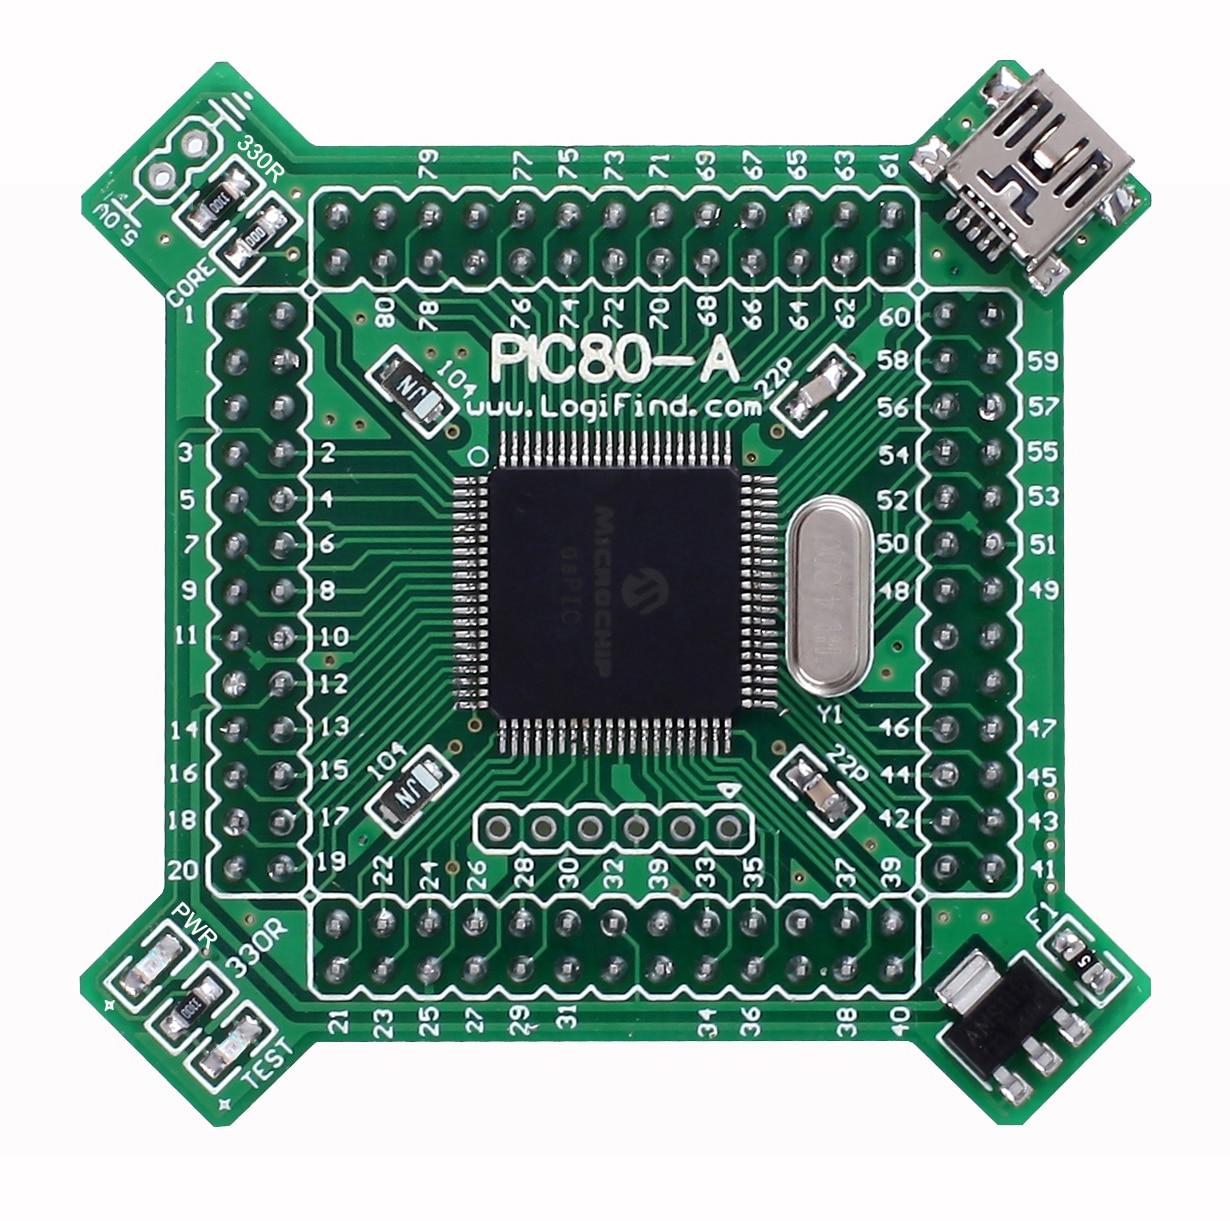 PIC24 MCU Learning Development Board Core Board PIC80-A with PIC24FJ128GB108(China)